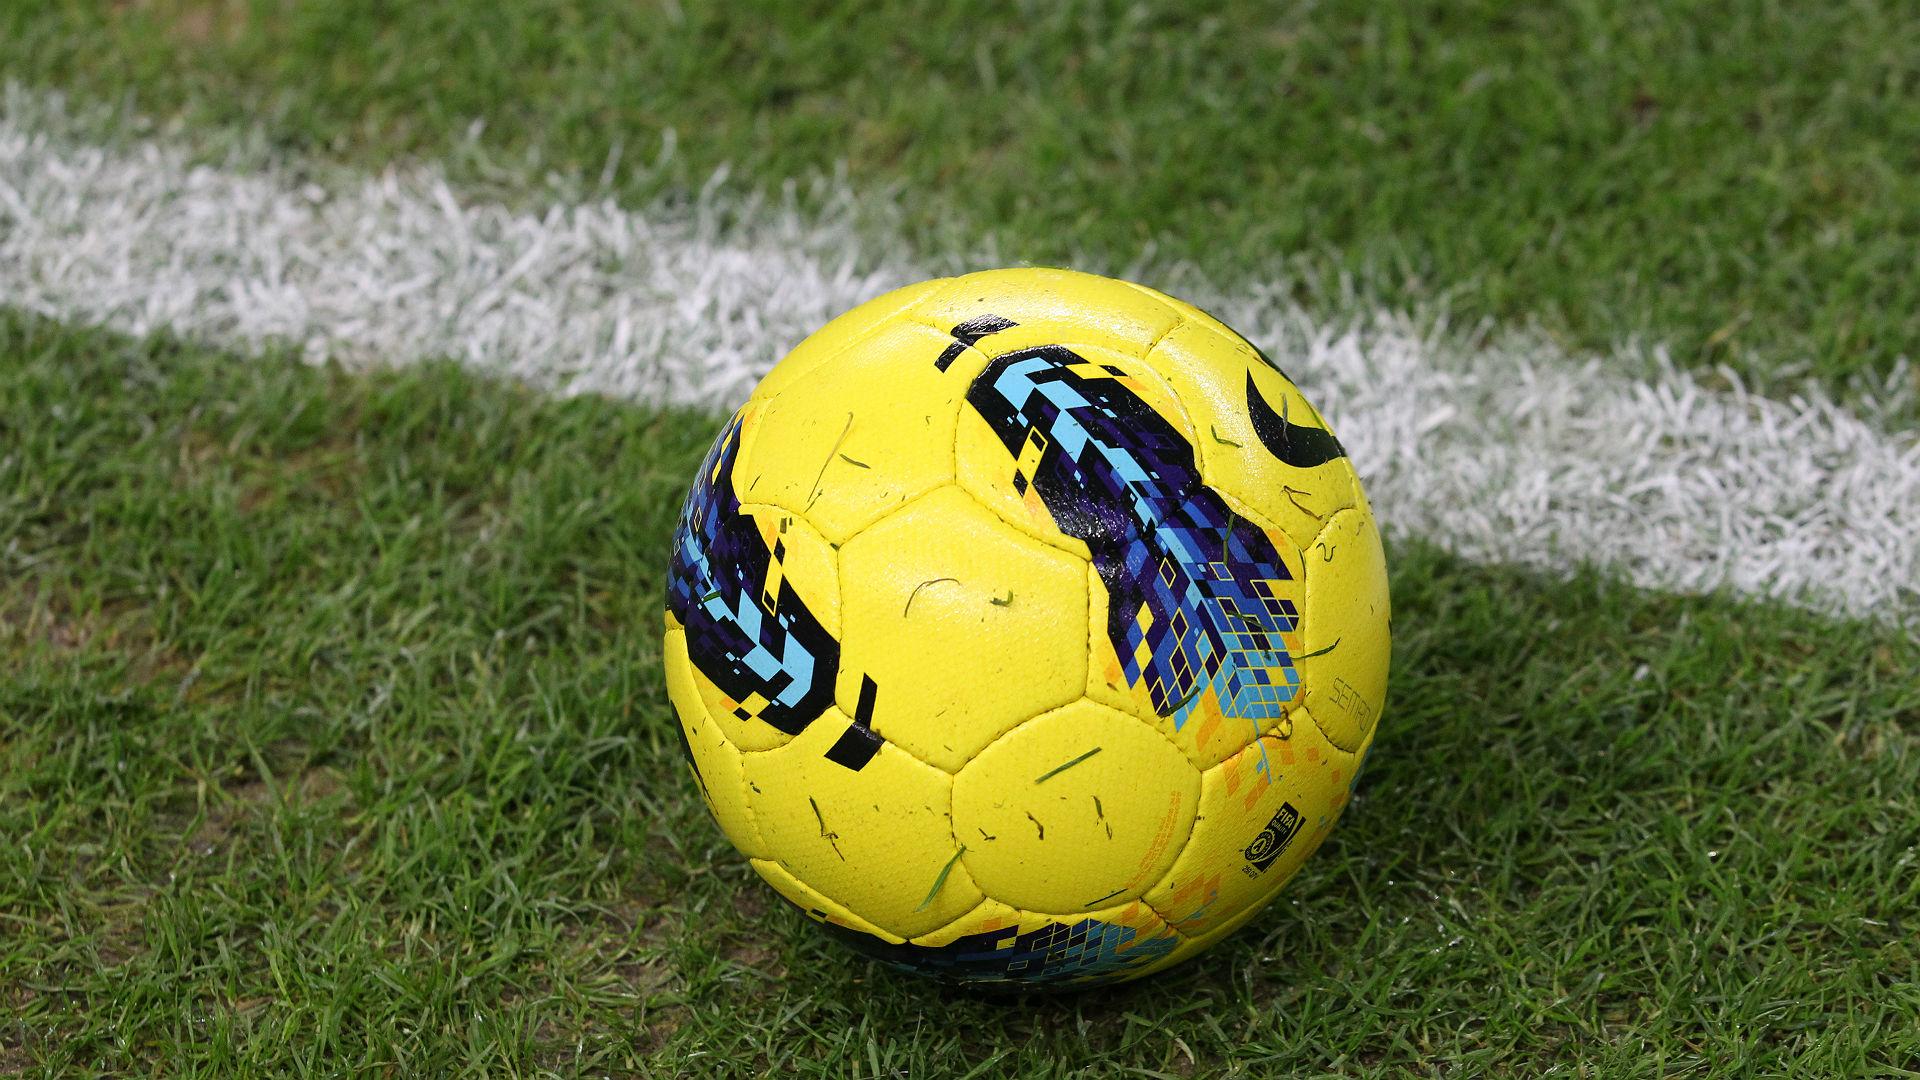 Soccer-ball-ftrjpg_53173zyqmuj1pxo39kl9t6hd